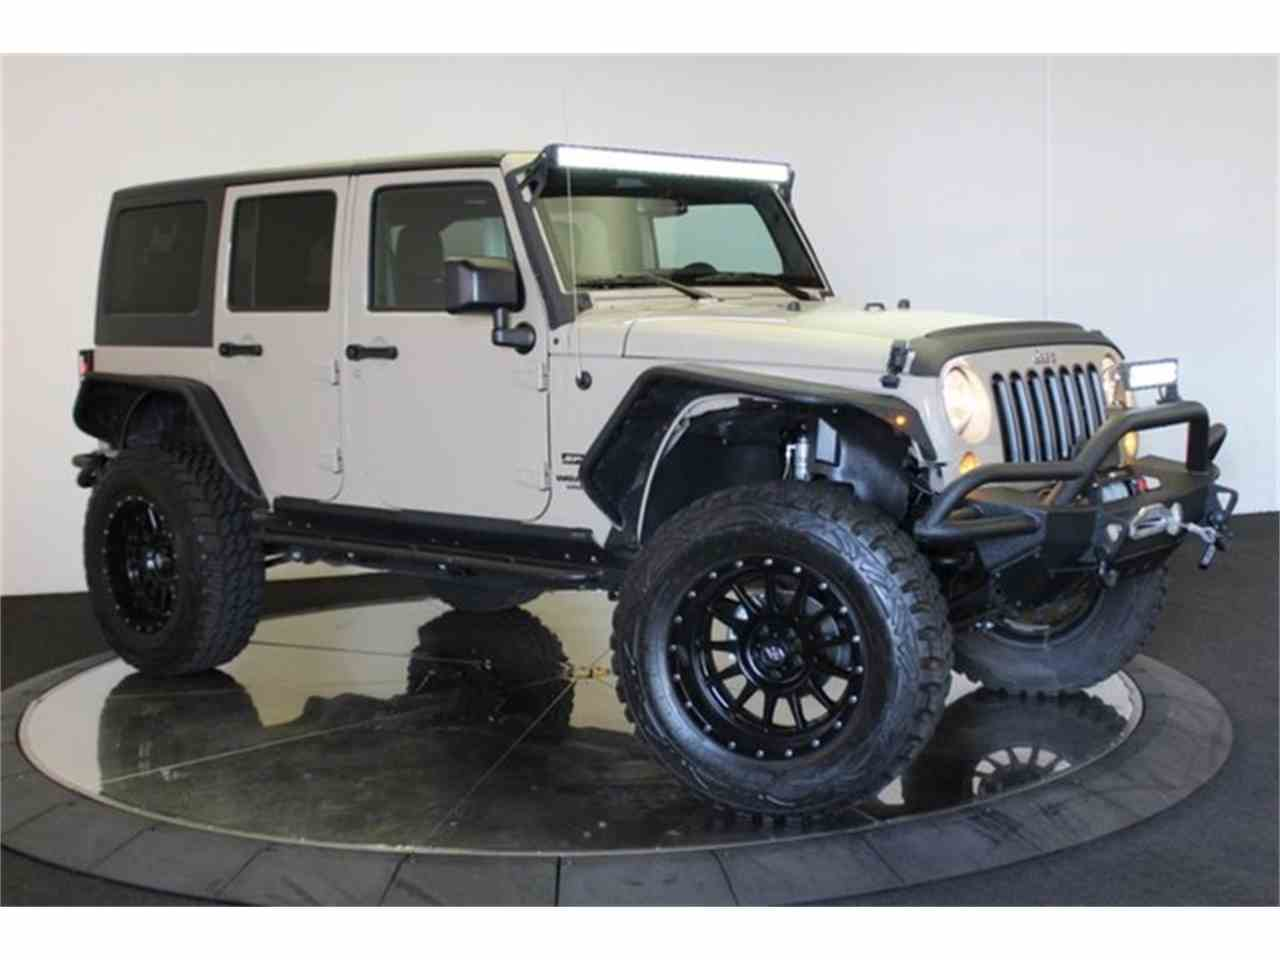 2016 Jeep Wrangler for Sale - CC-989518